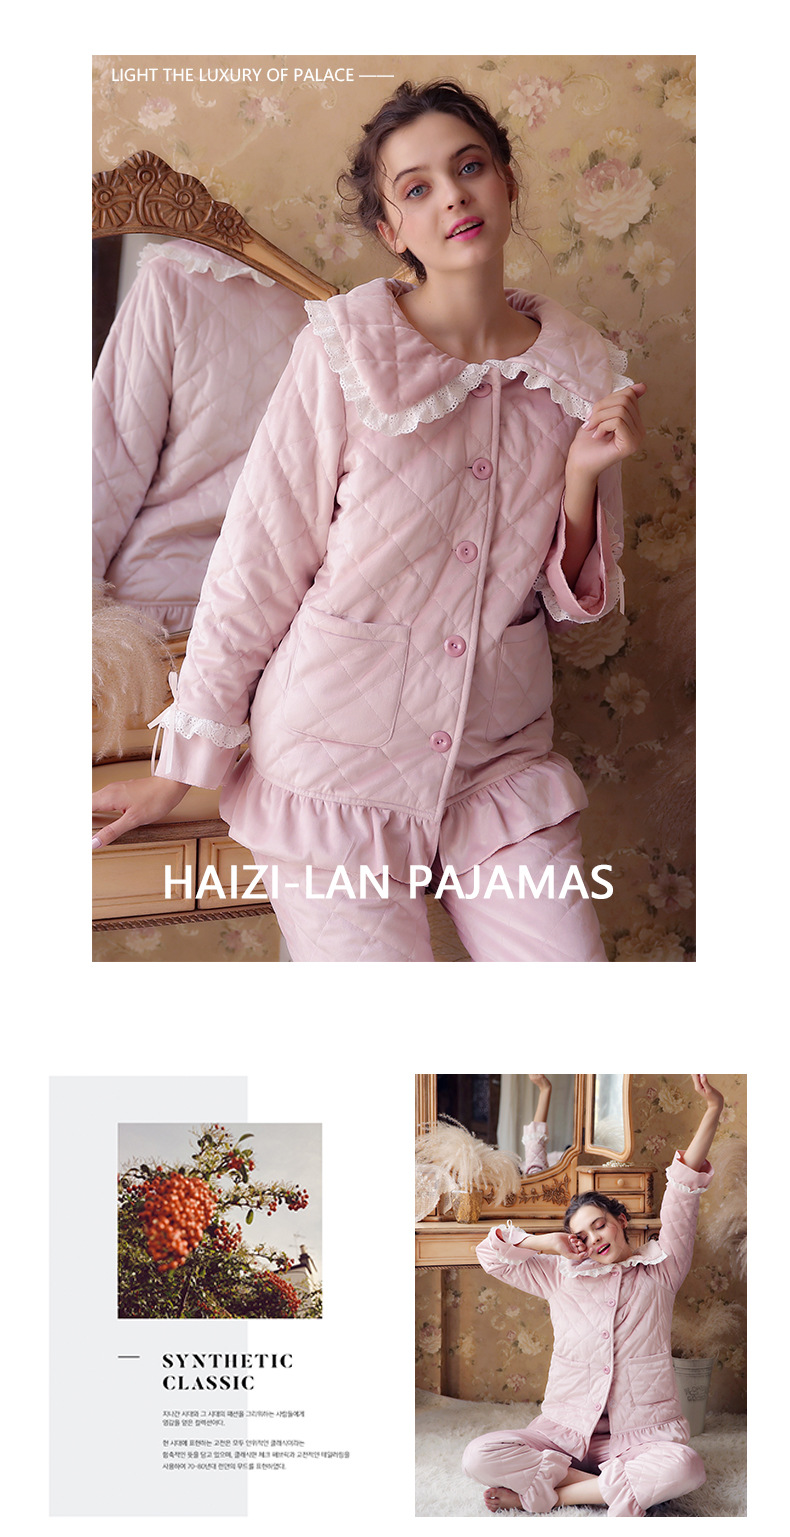 Autumn Winter New Ladies Thick Long-sleeved Cotton Princess Pijama Pregnant Fashion Cardigan 2PCS Maternity Pajamas Set YFQ260 1